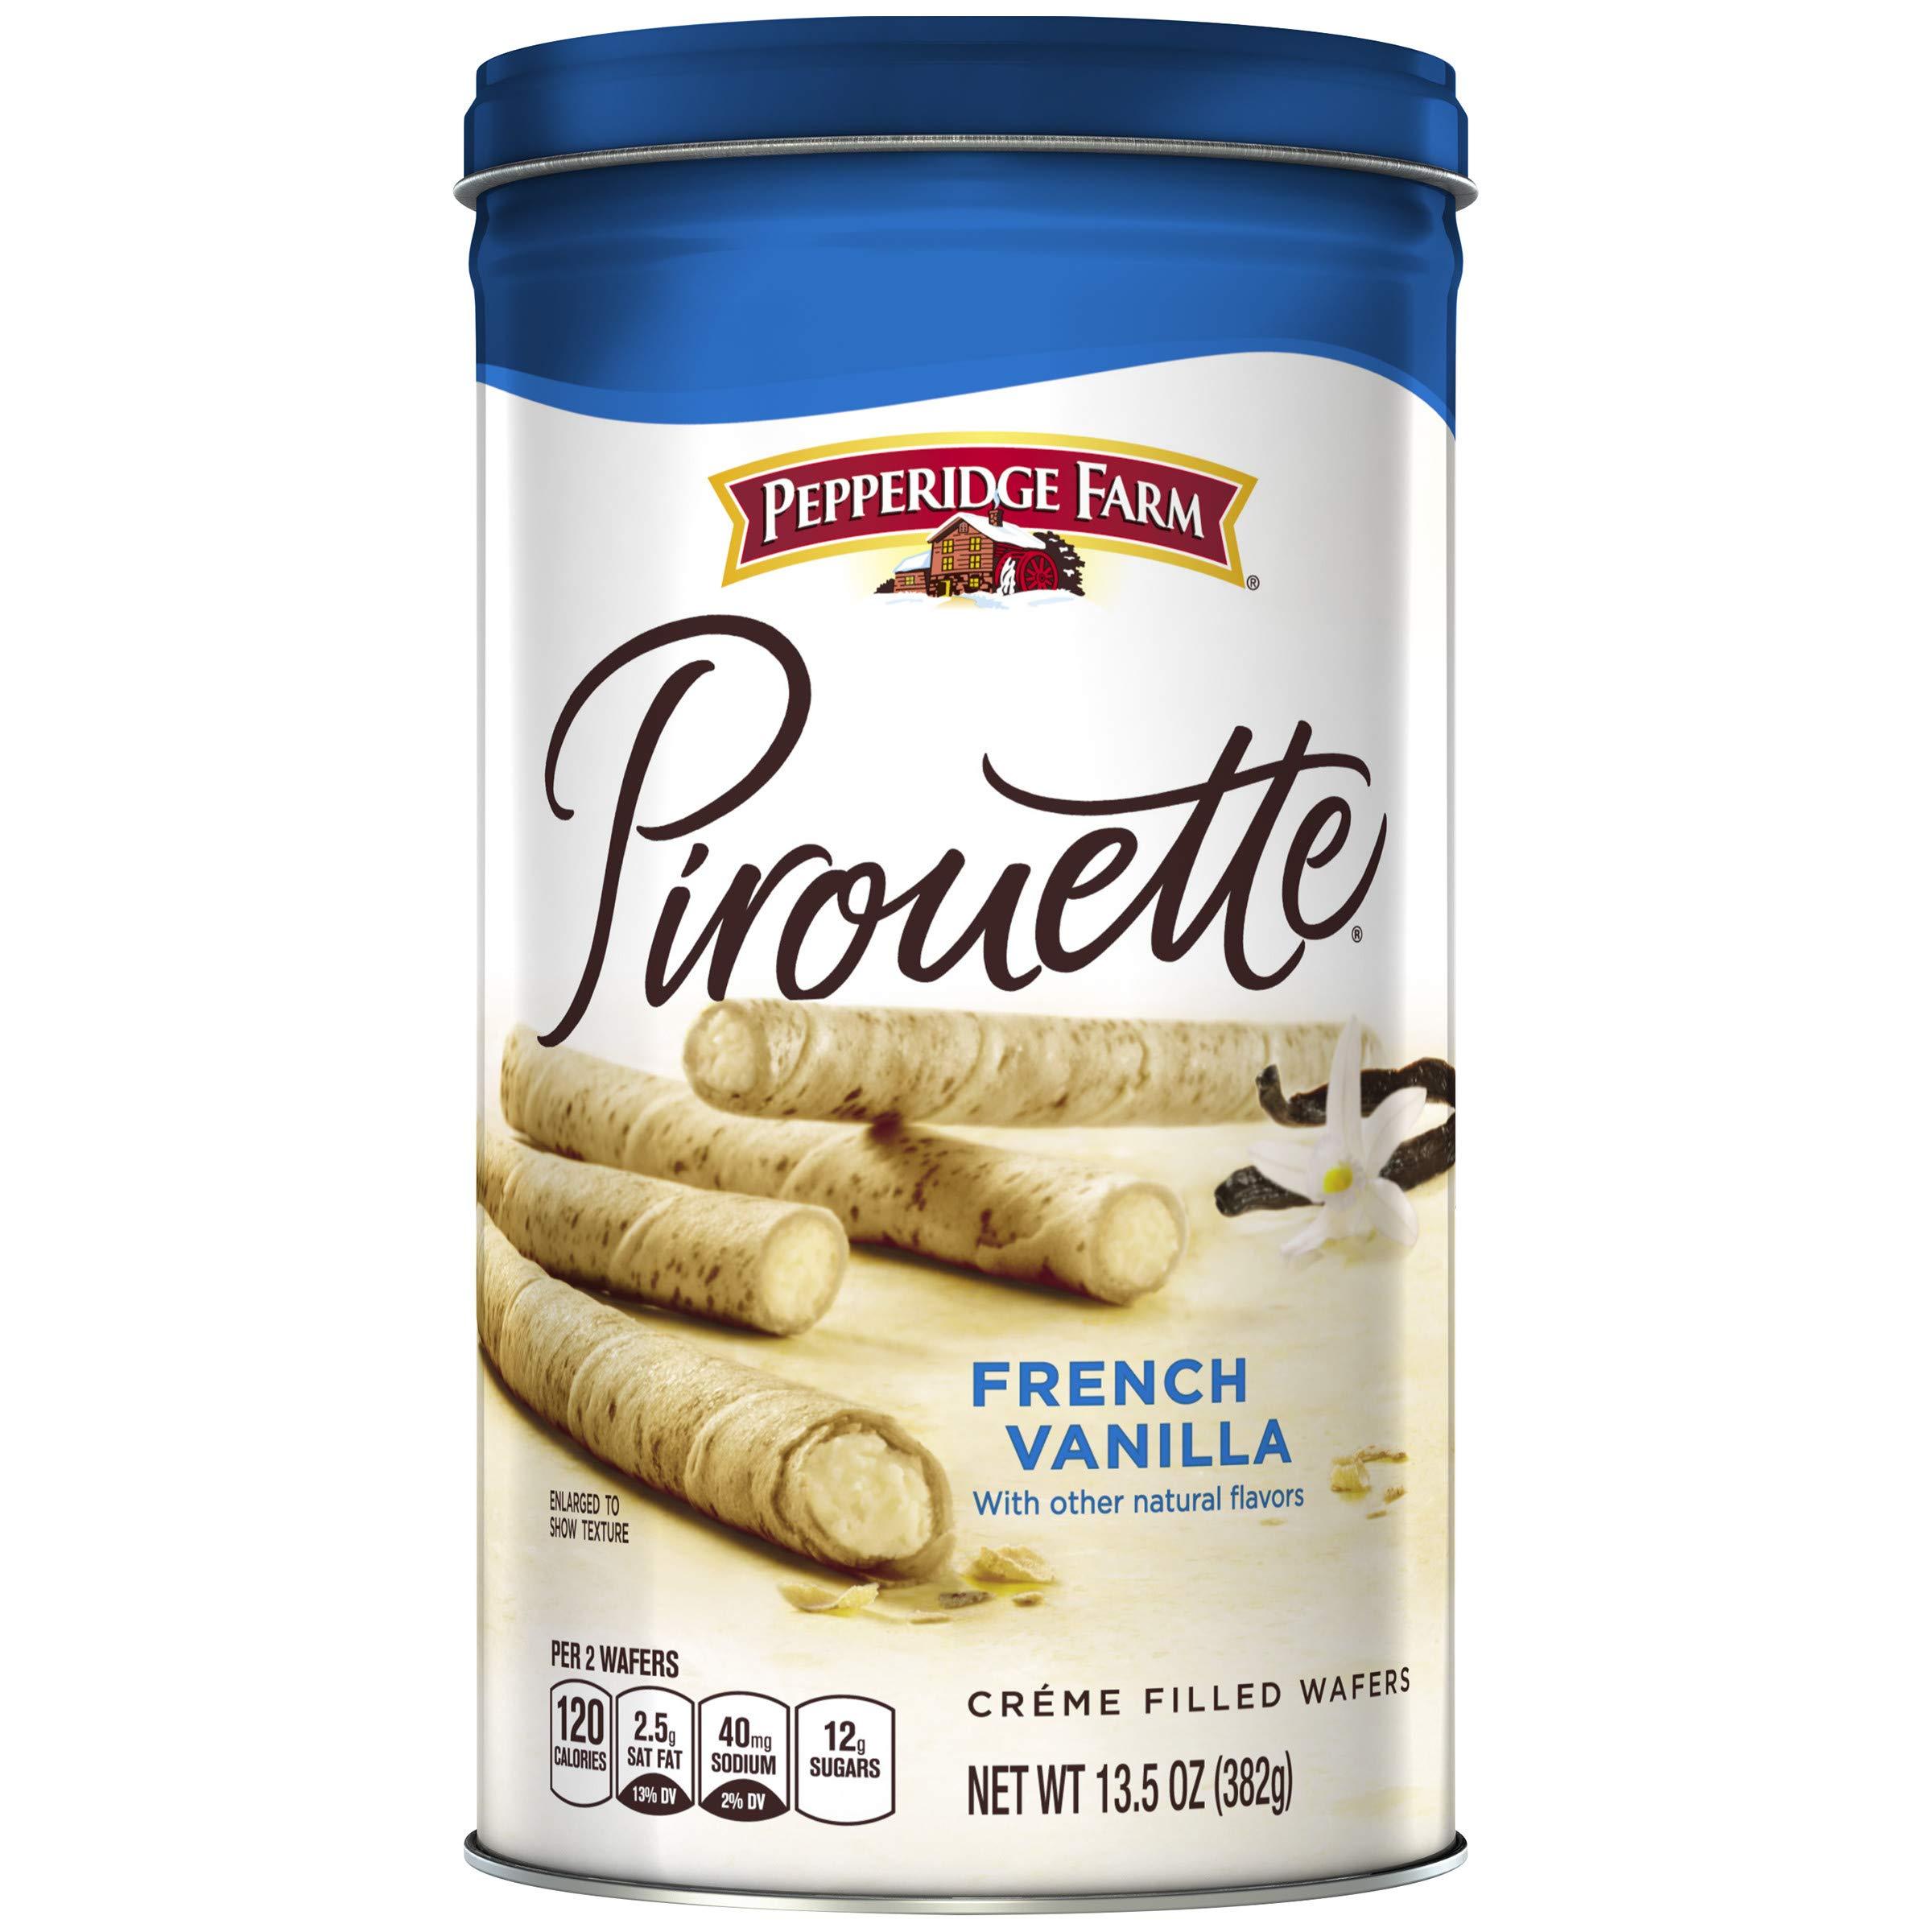 Pepperidge Farm Pirouette Crème Filled Wafers French Vanilla Cookies, 13.5 oz. Tin